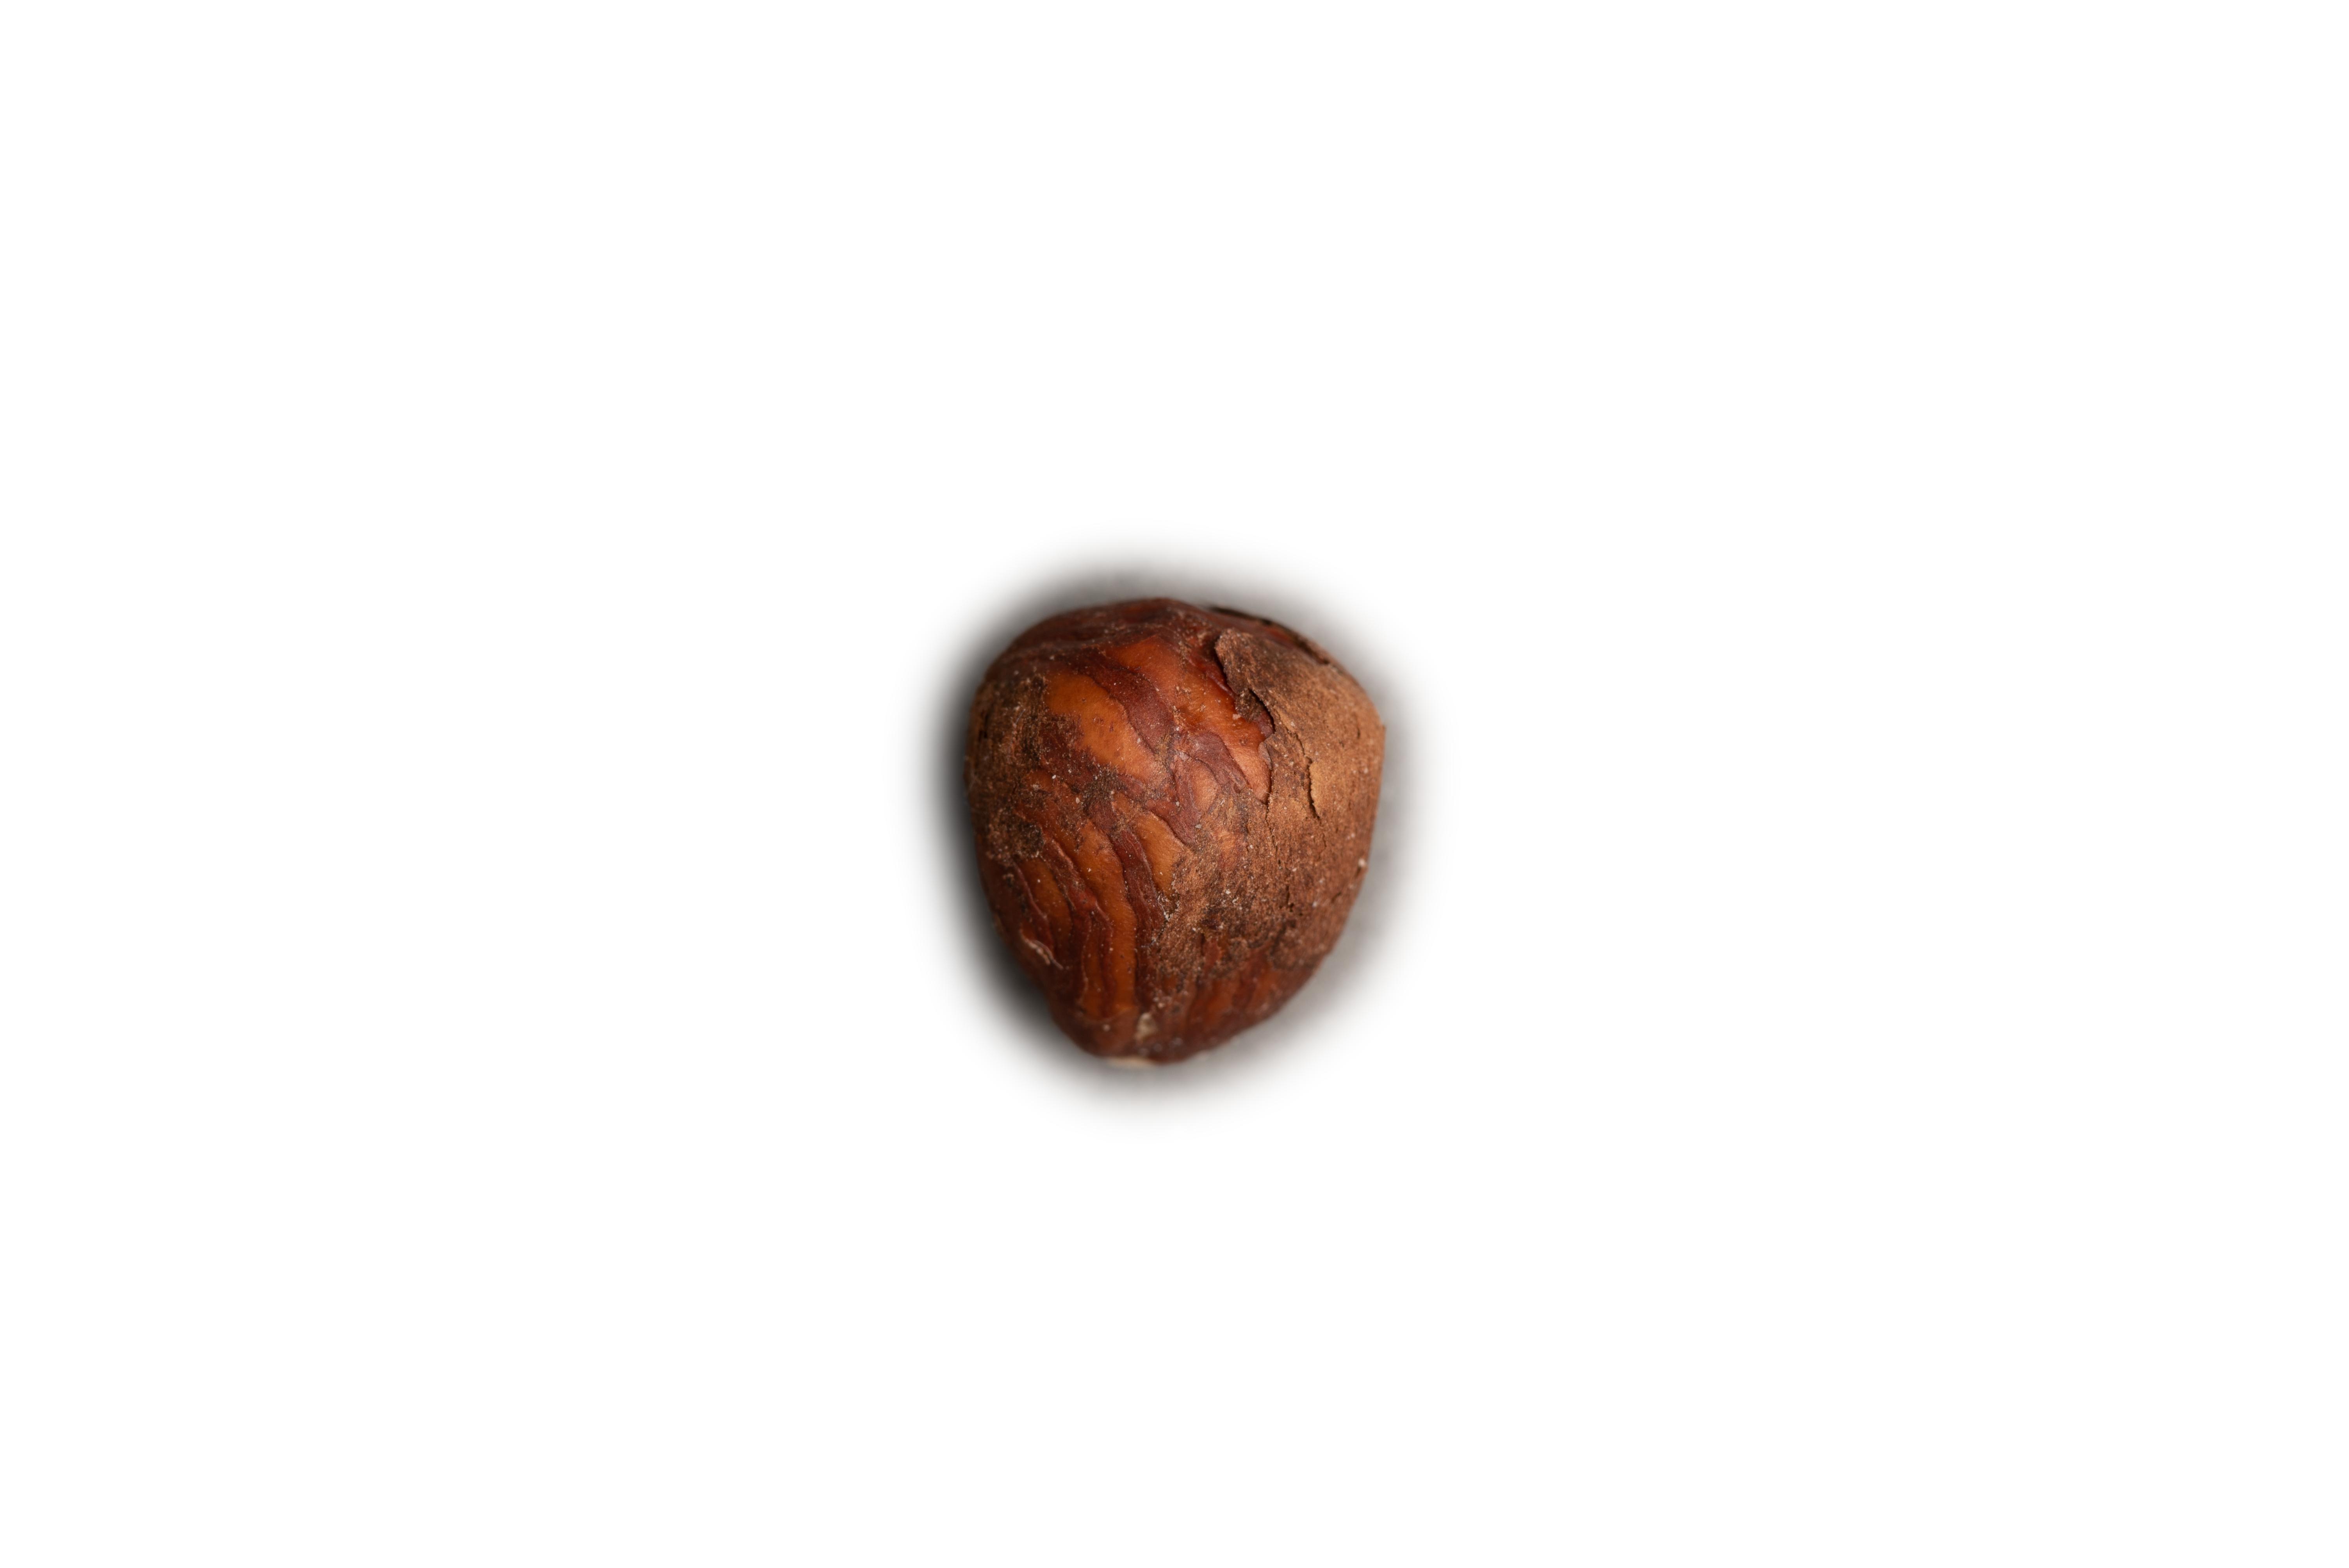 Nut-6